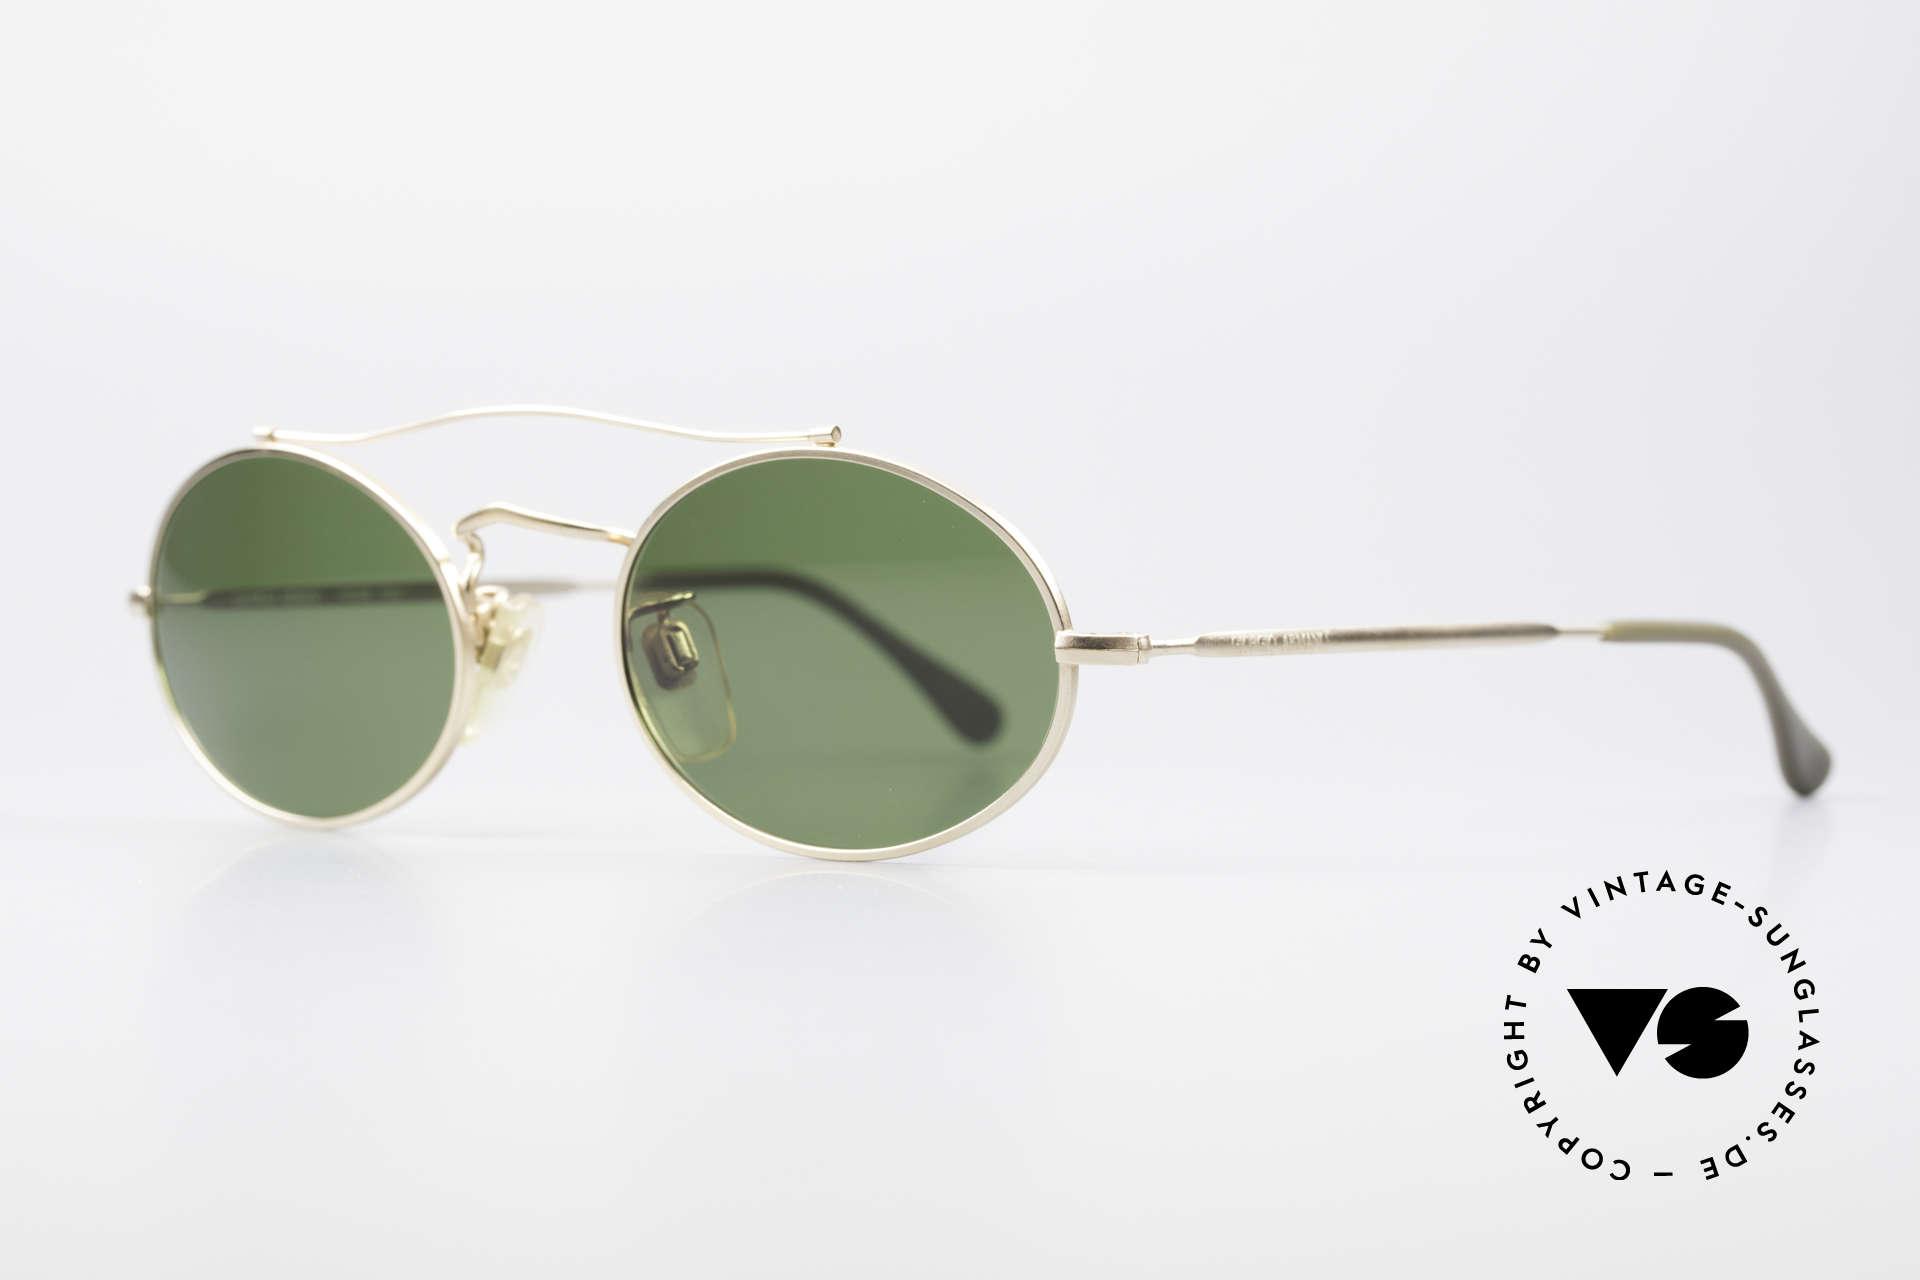 Giorgio Armani 115 90's Designer Sunglasses, with grass green sun lenses (100% UV protection), Made for Men and Women